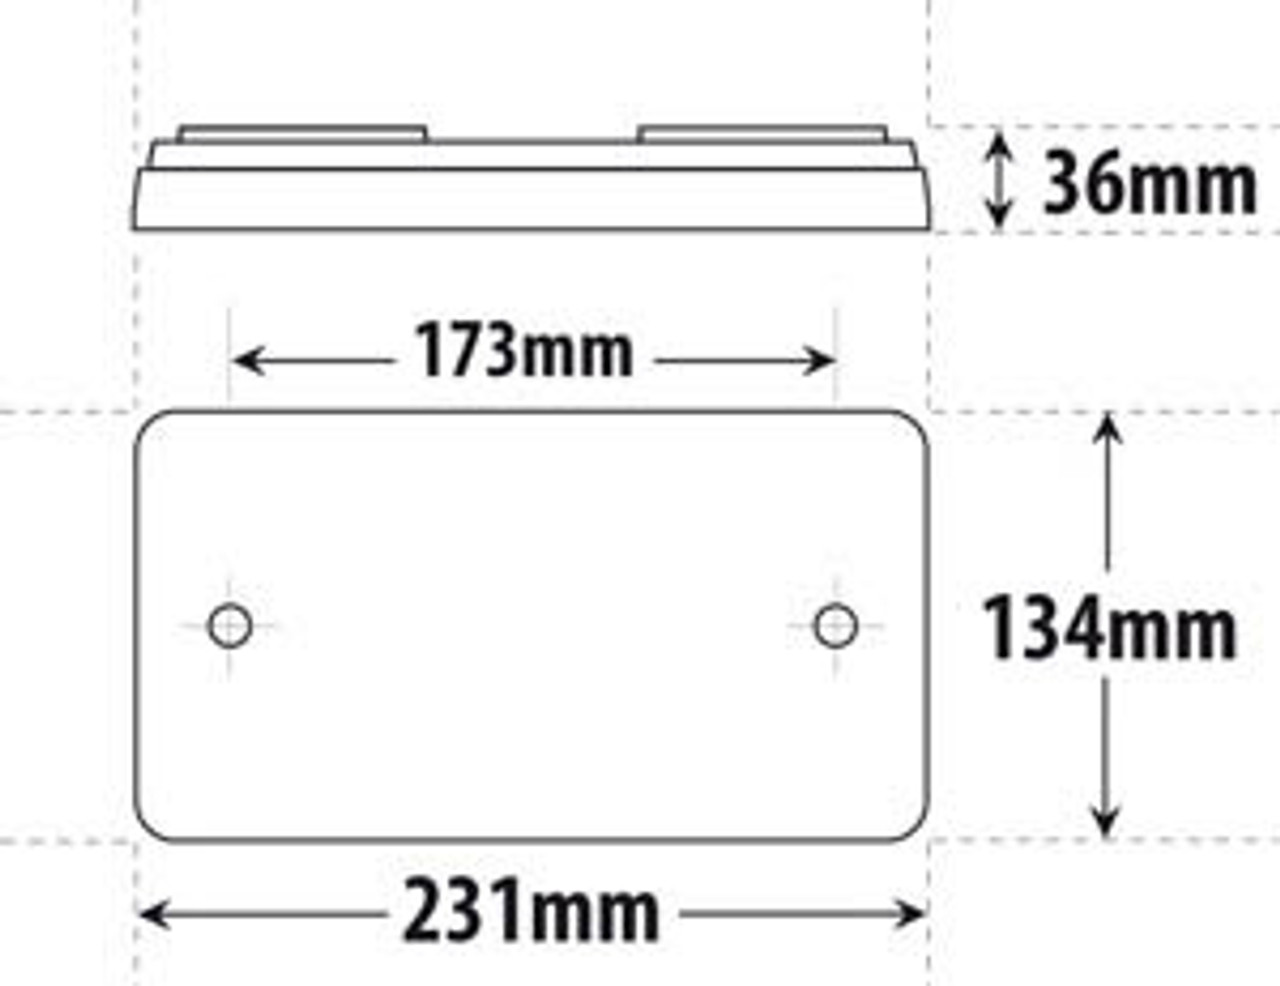 Line Drawing - Dimensions: 231 x 134 x 36mm